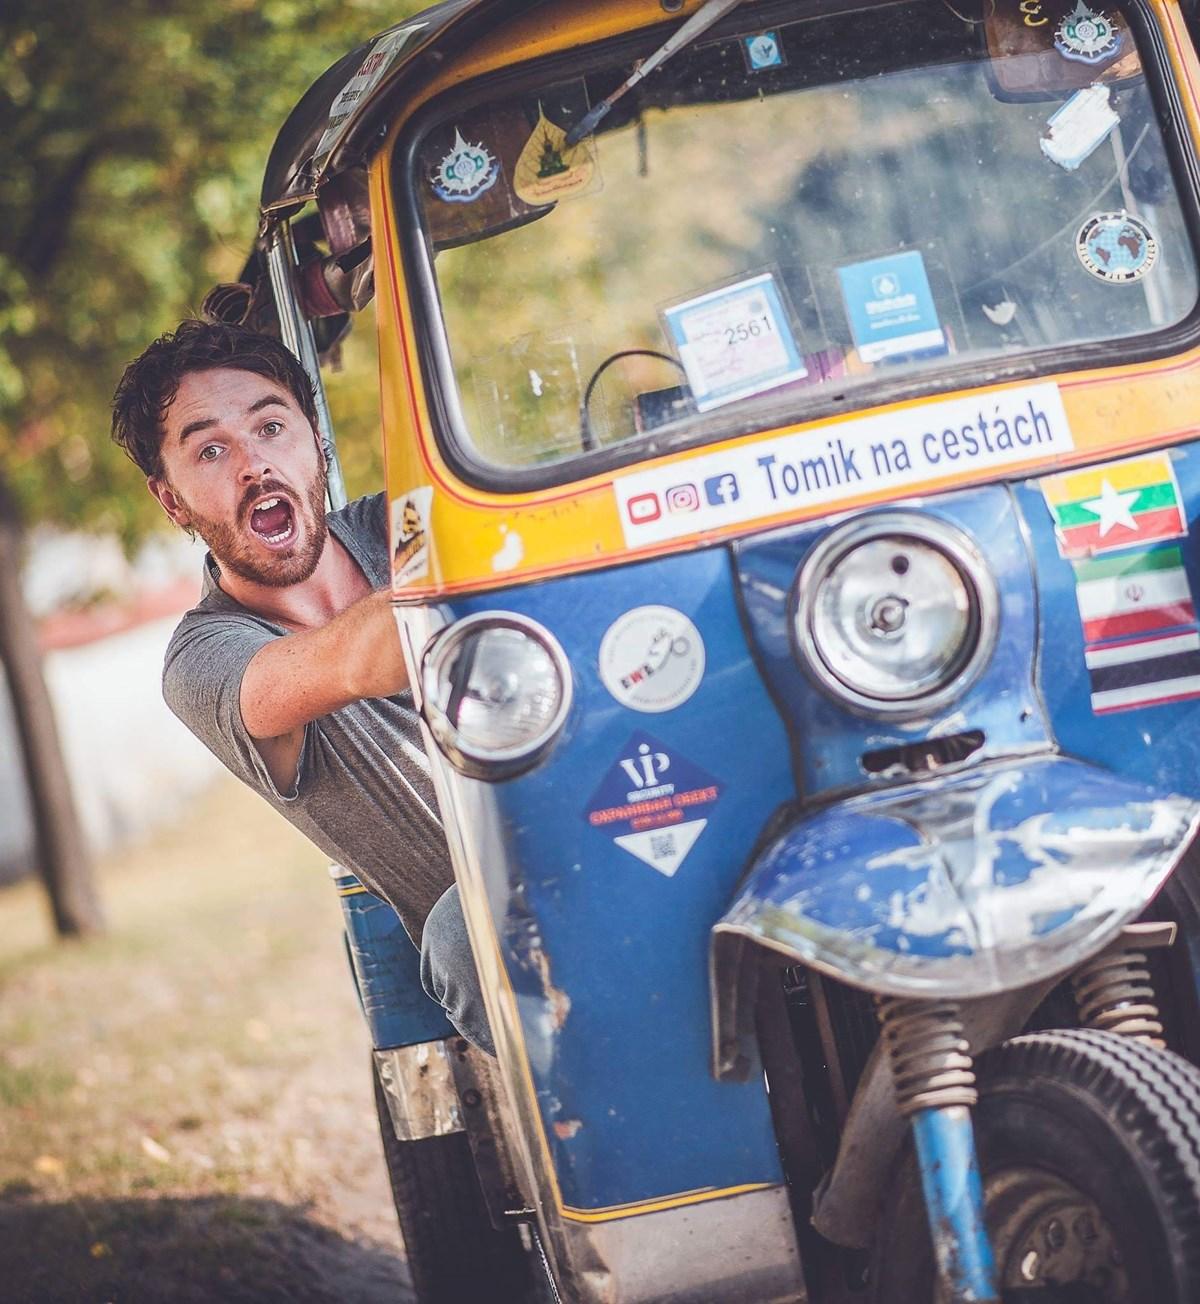 Tuktukem z Thajska až na Moravu s Tomíkem / Ostrava